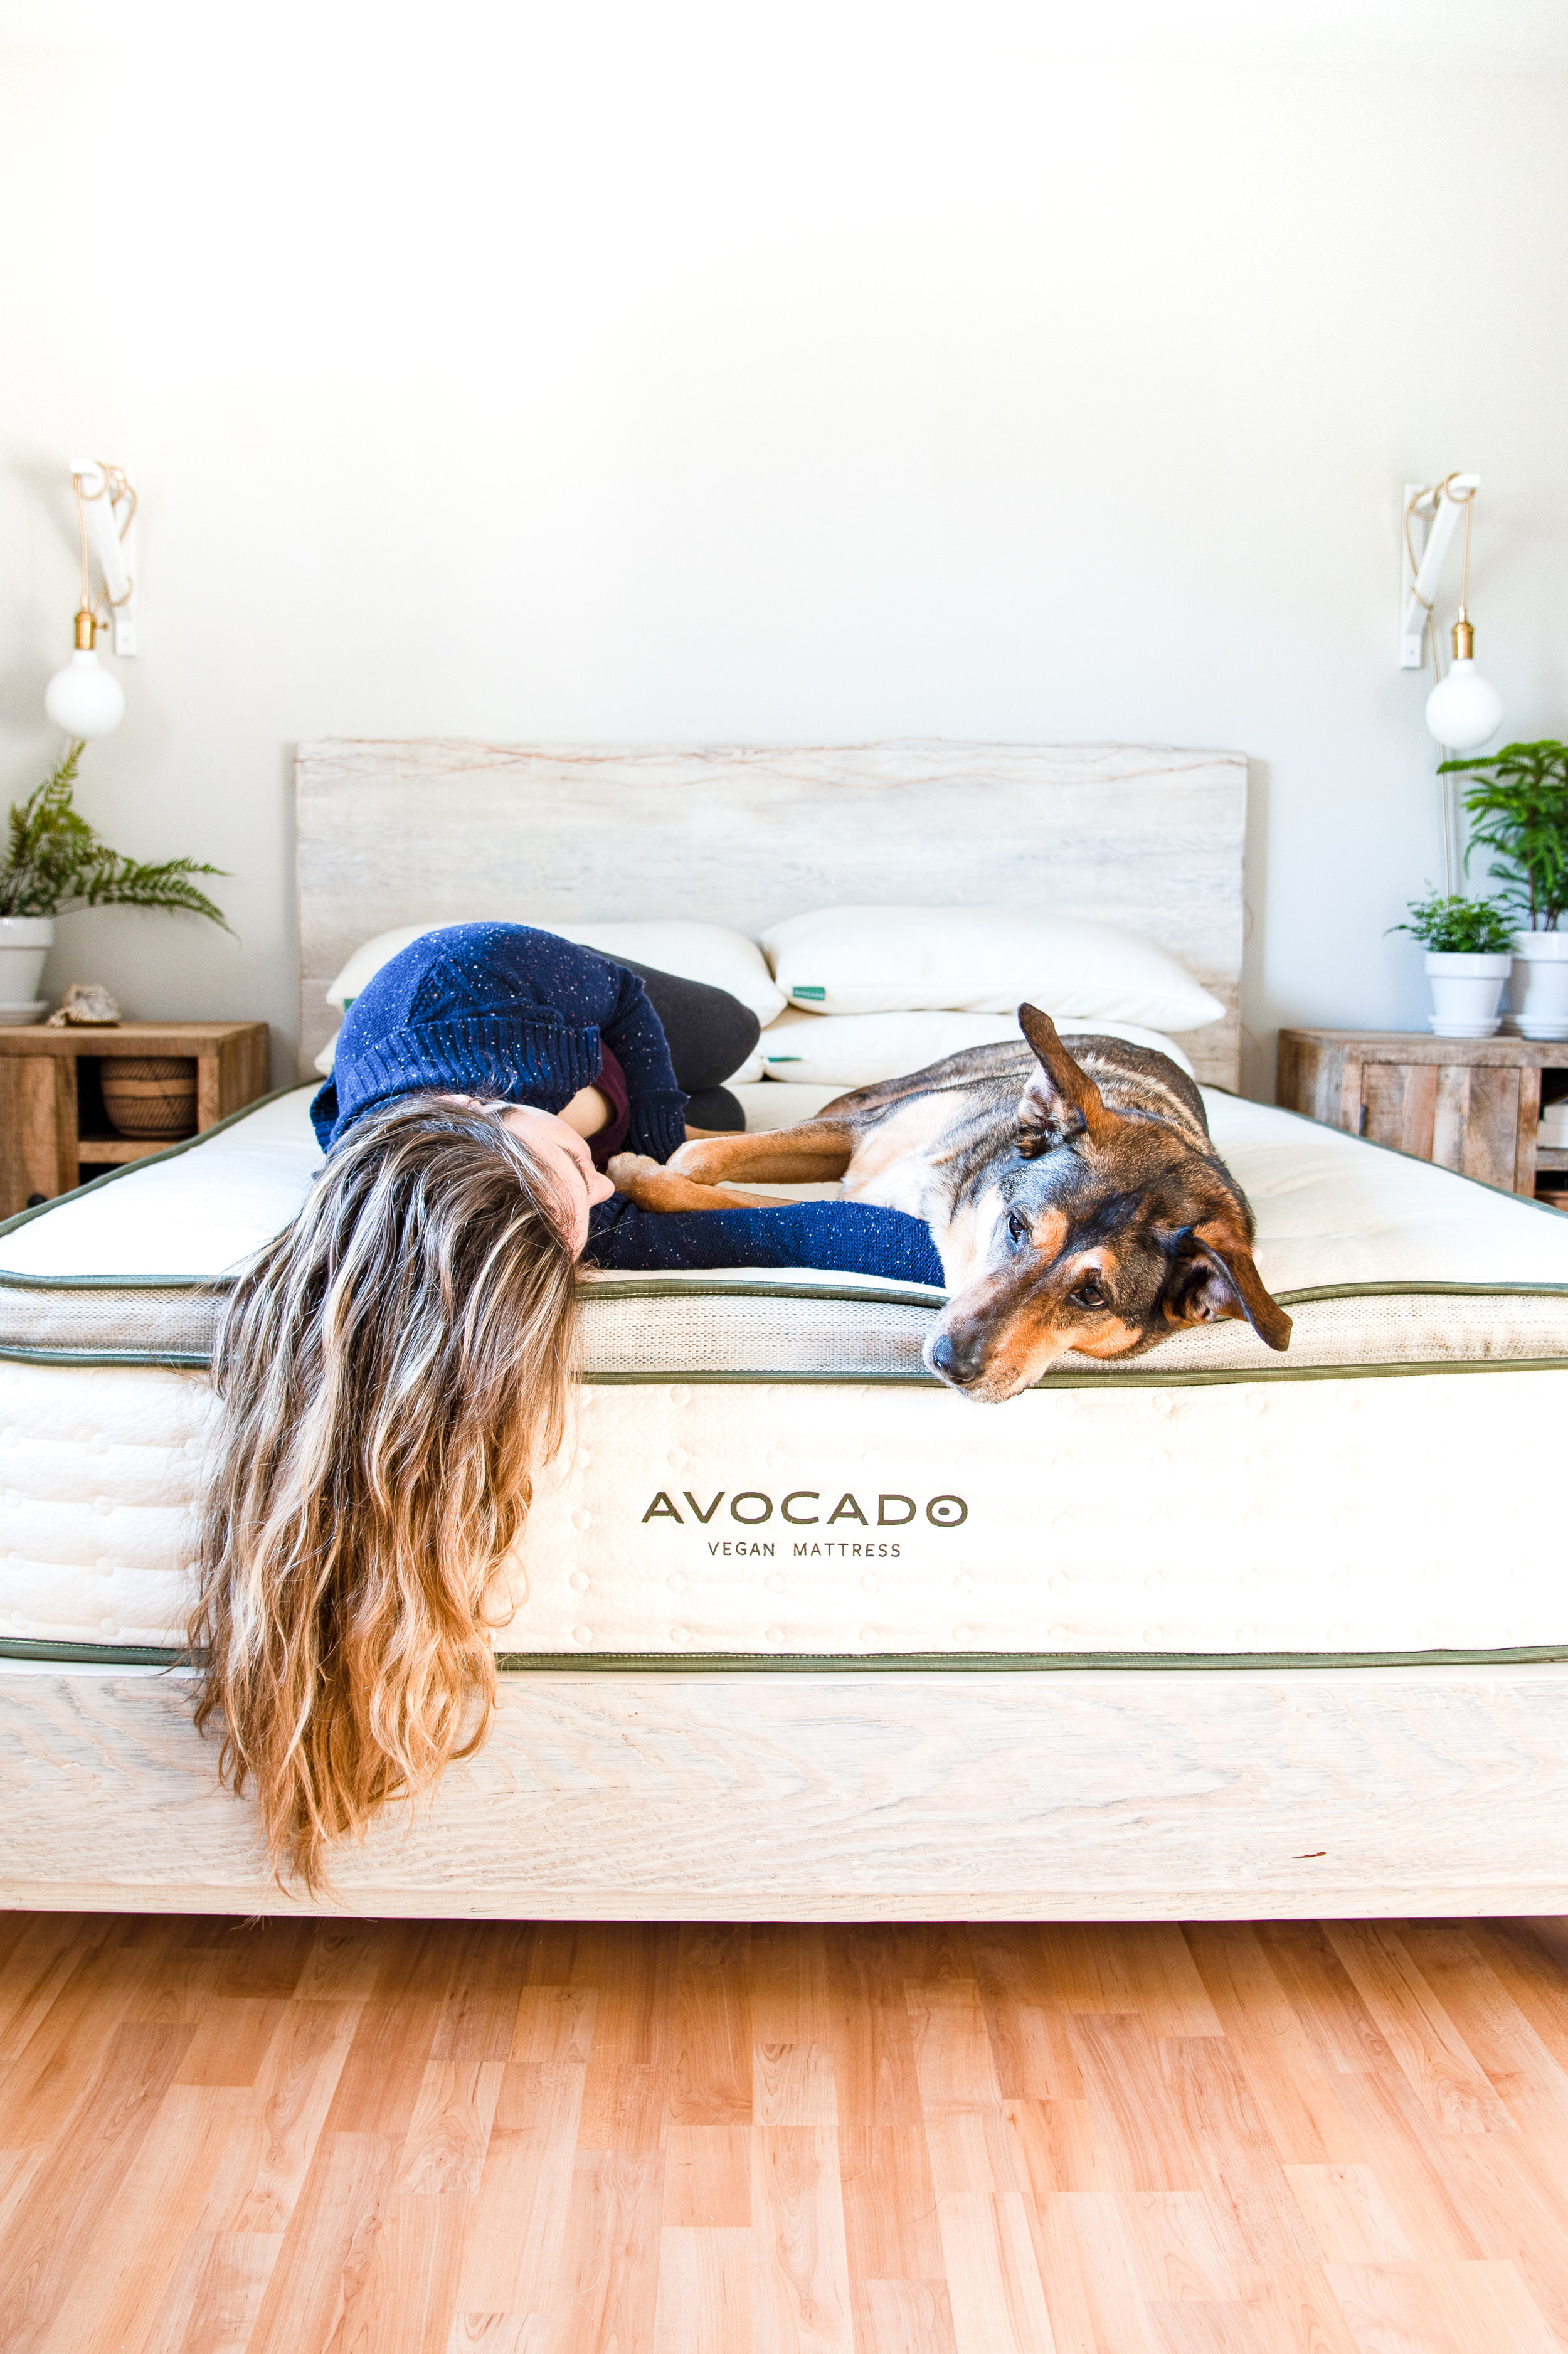 avocado green mattress+ natural wood bedframe -